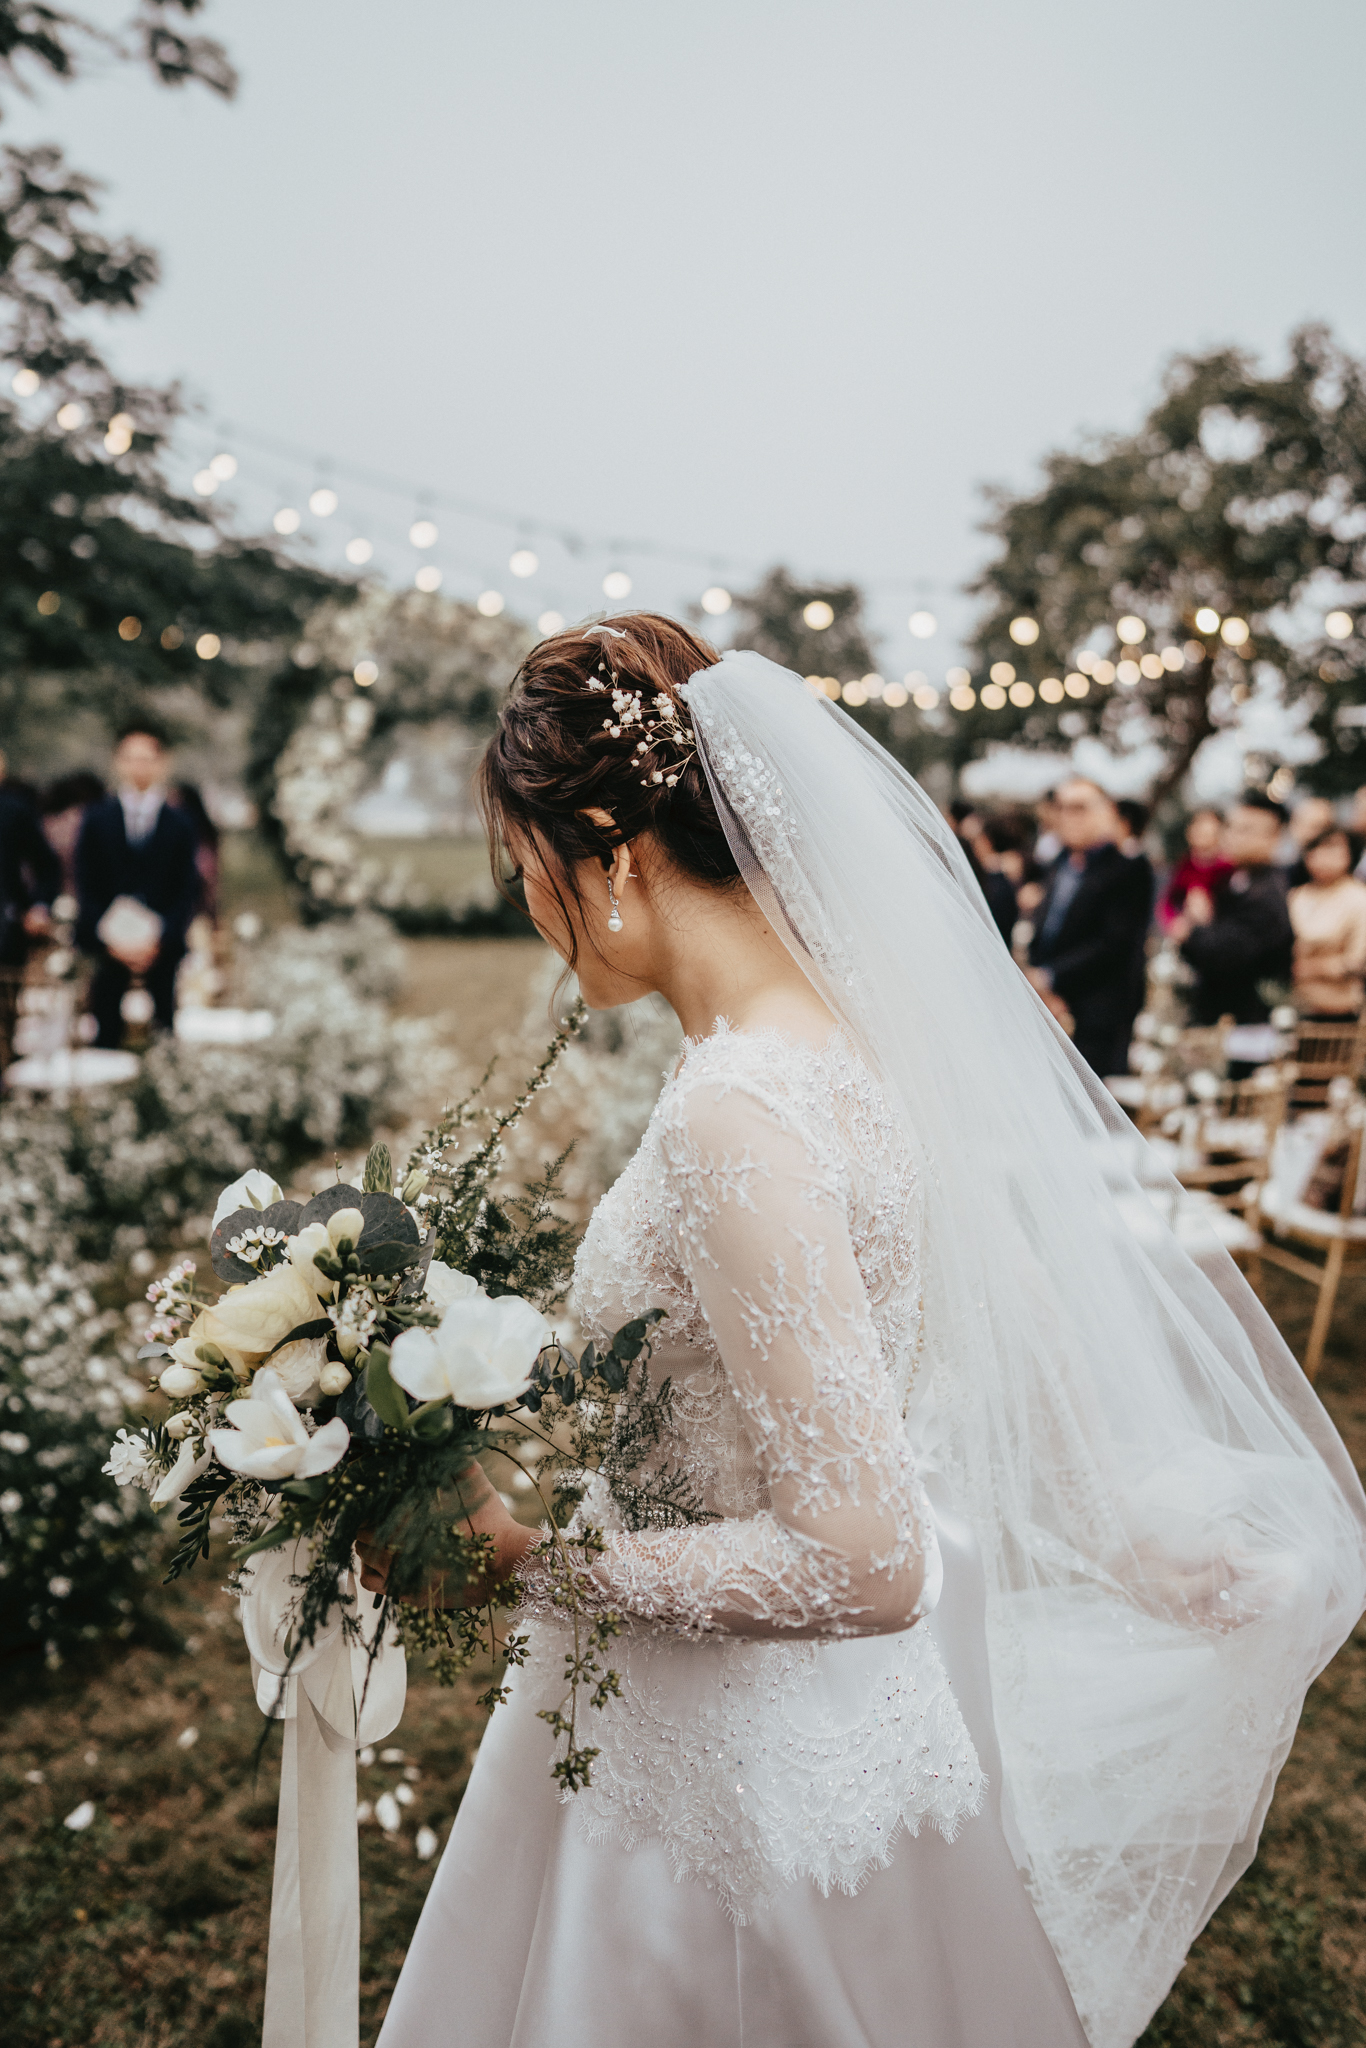 JWMarriott Ha Noi Intimate Wedding of Trang Hi well captured by Hipster Wedding Vietnam Wedding Photographer-35968.jpg